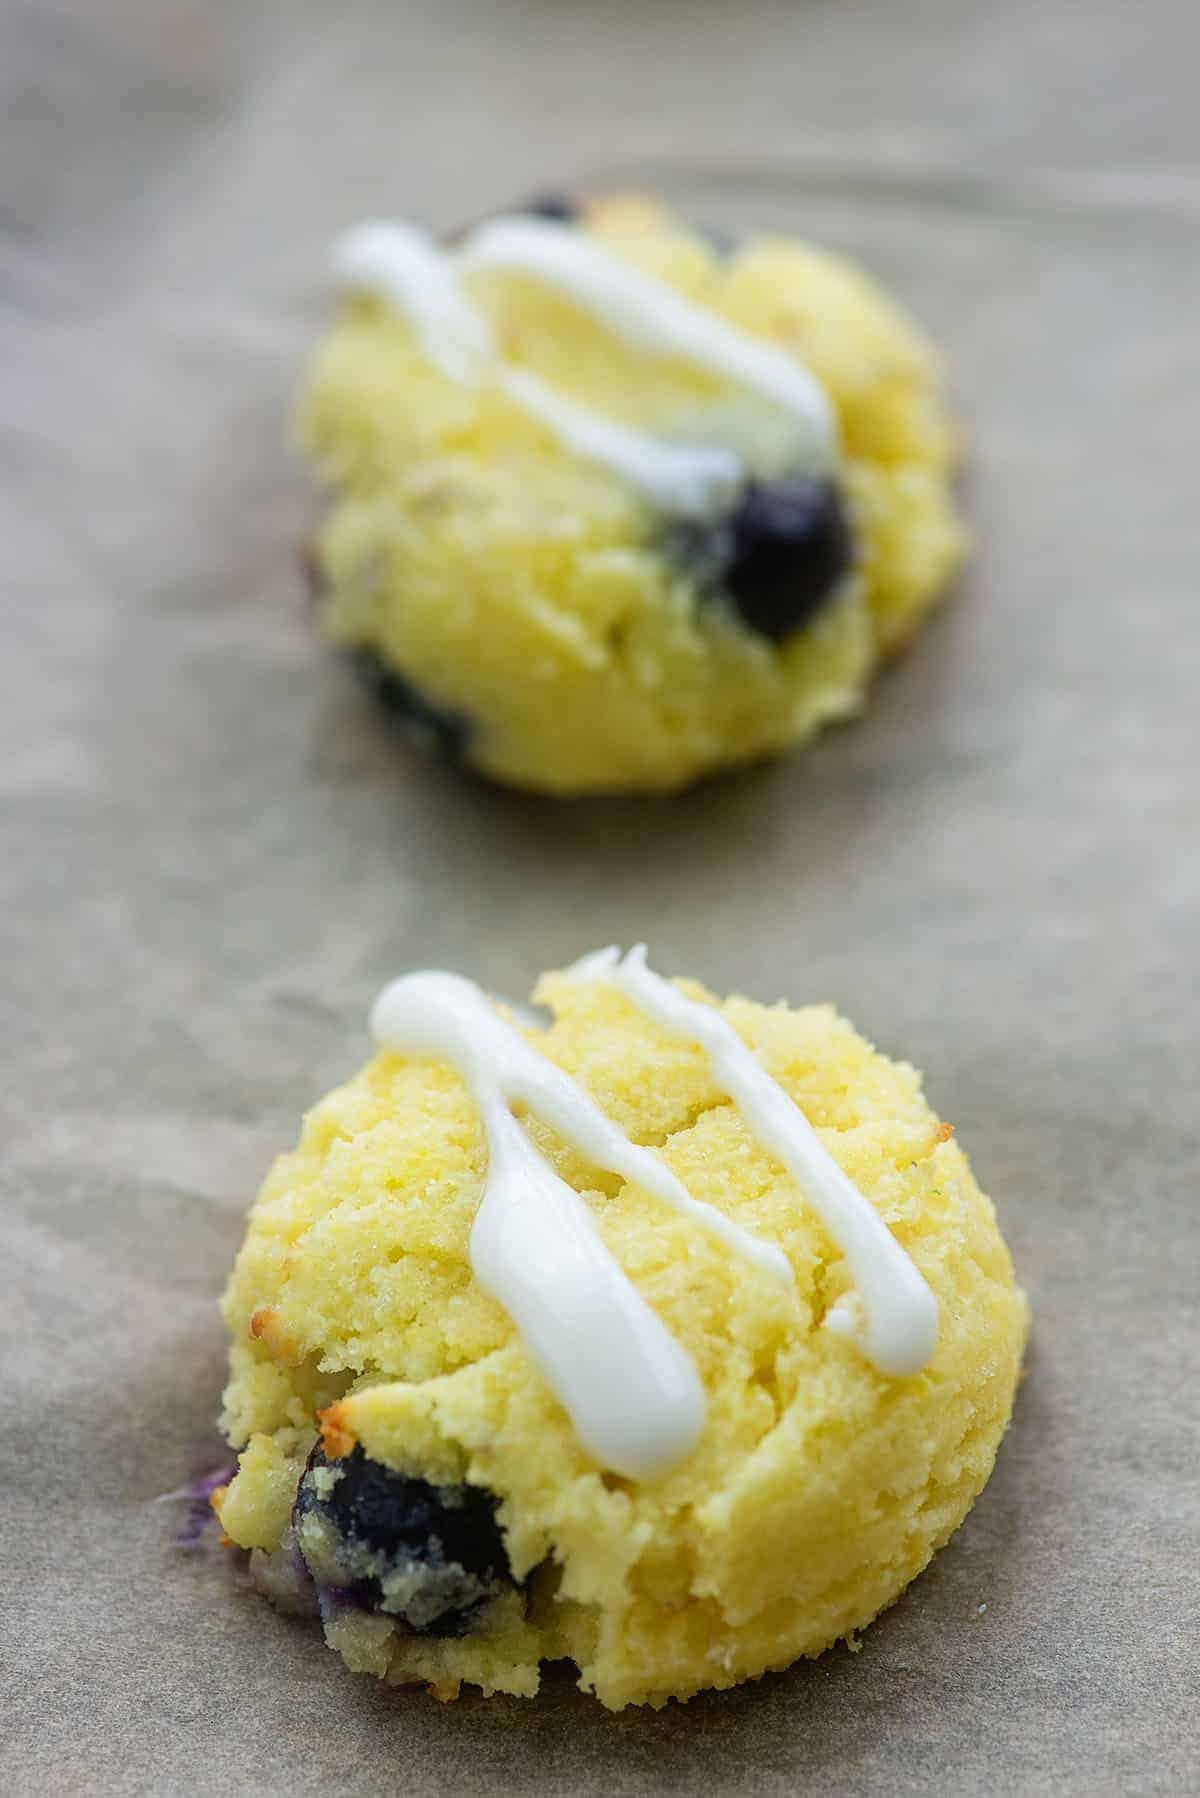 blueberry glazed cookies on baking sheet